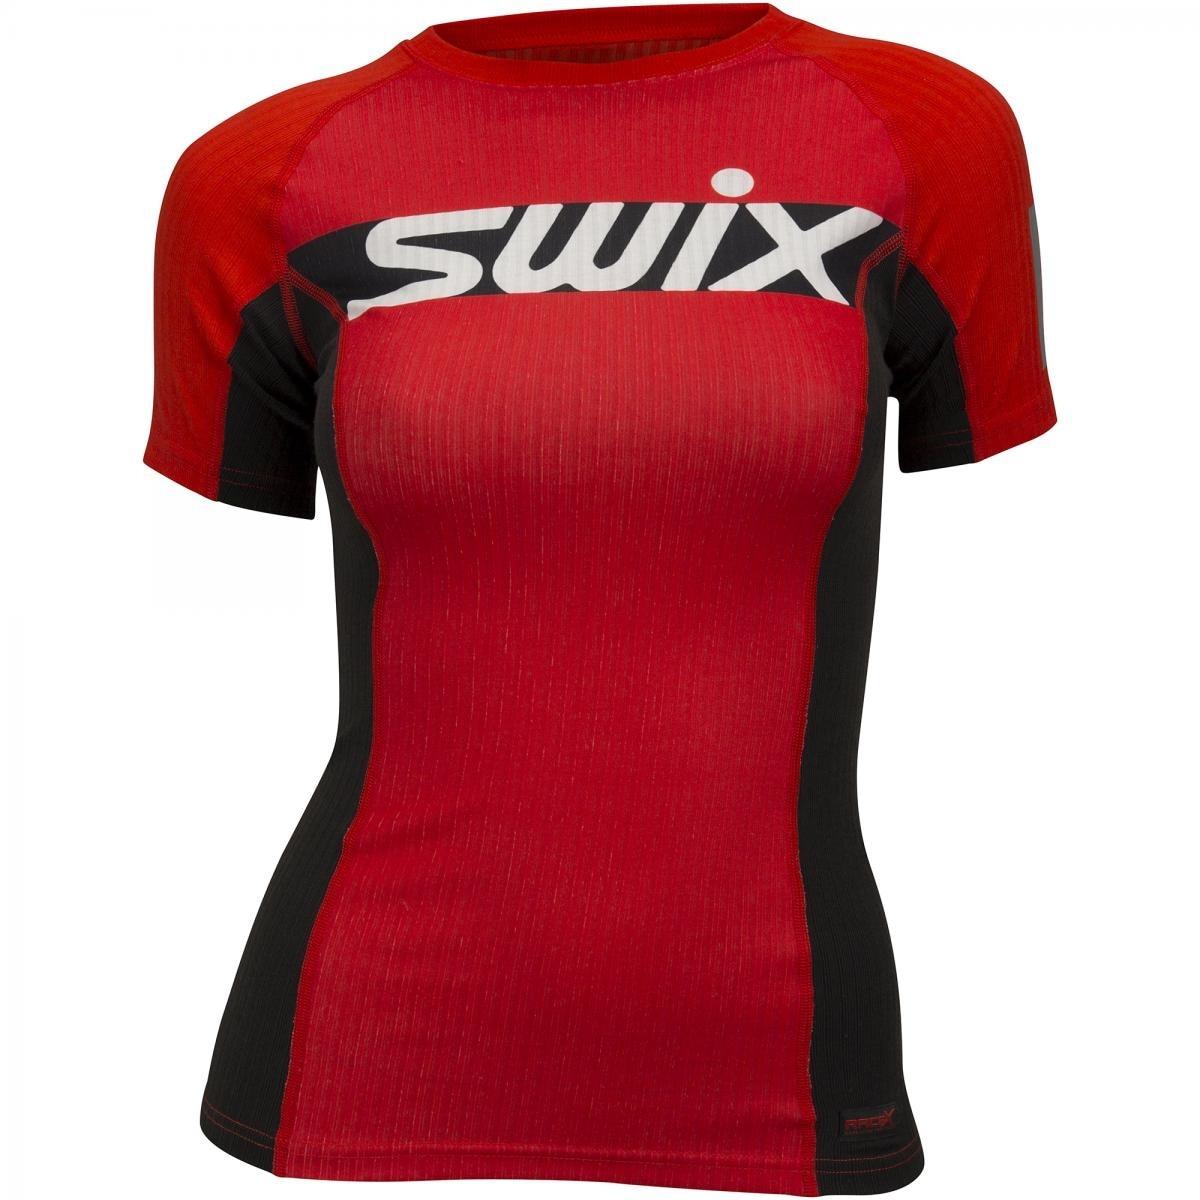 Swix RaceX Carbon Treningstrøye Dame Rød/Sort